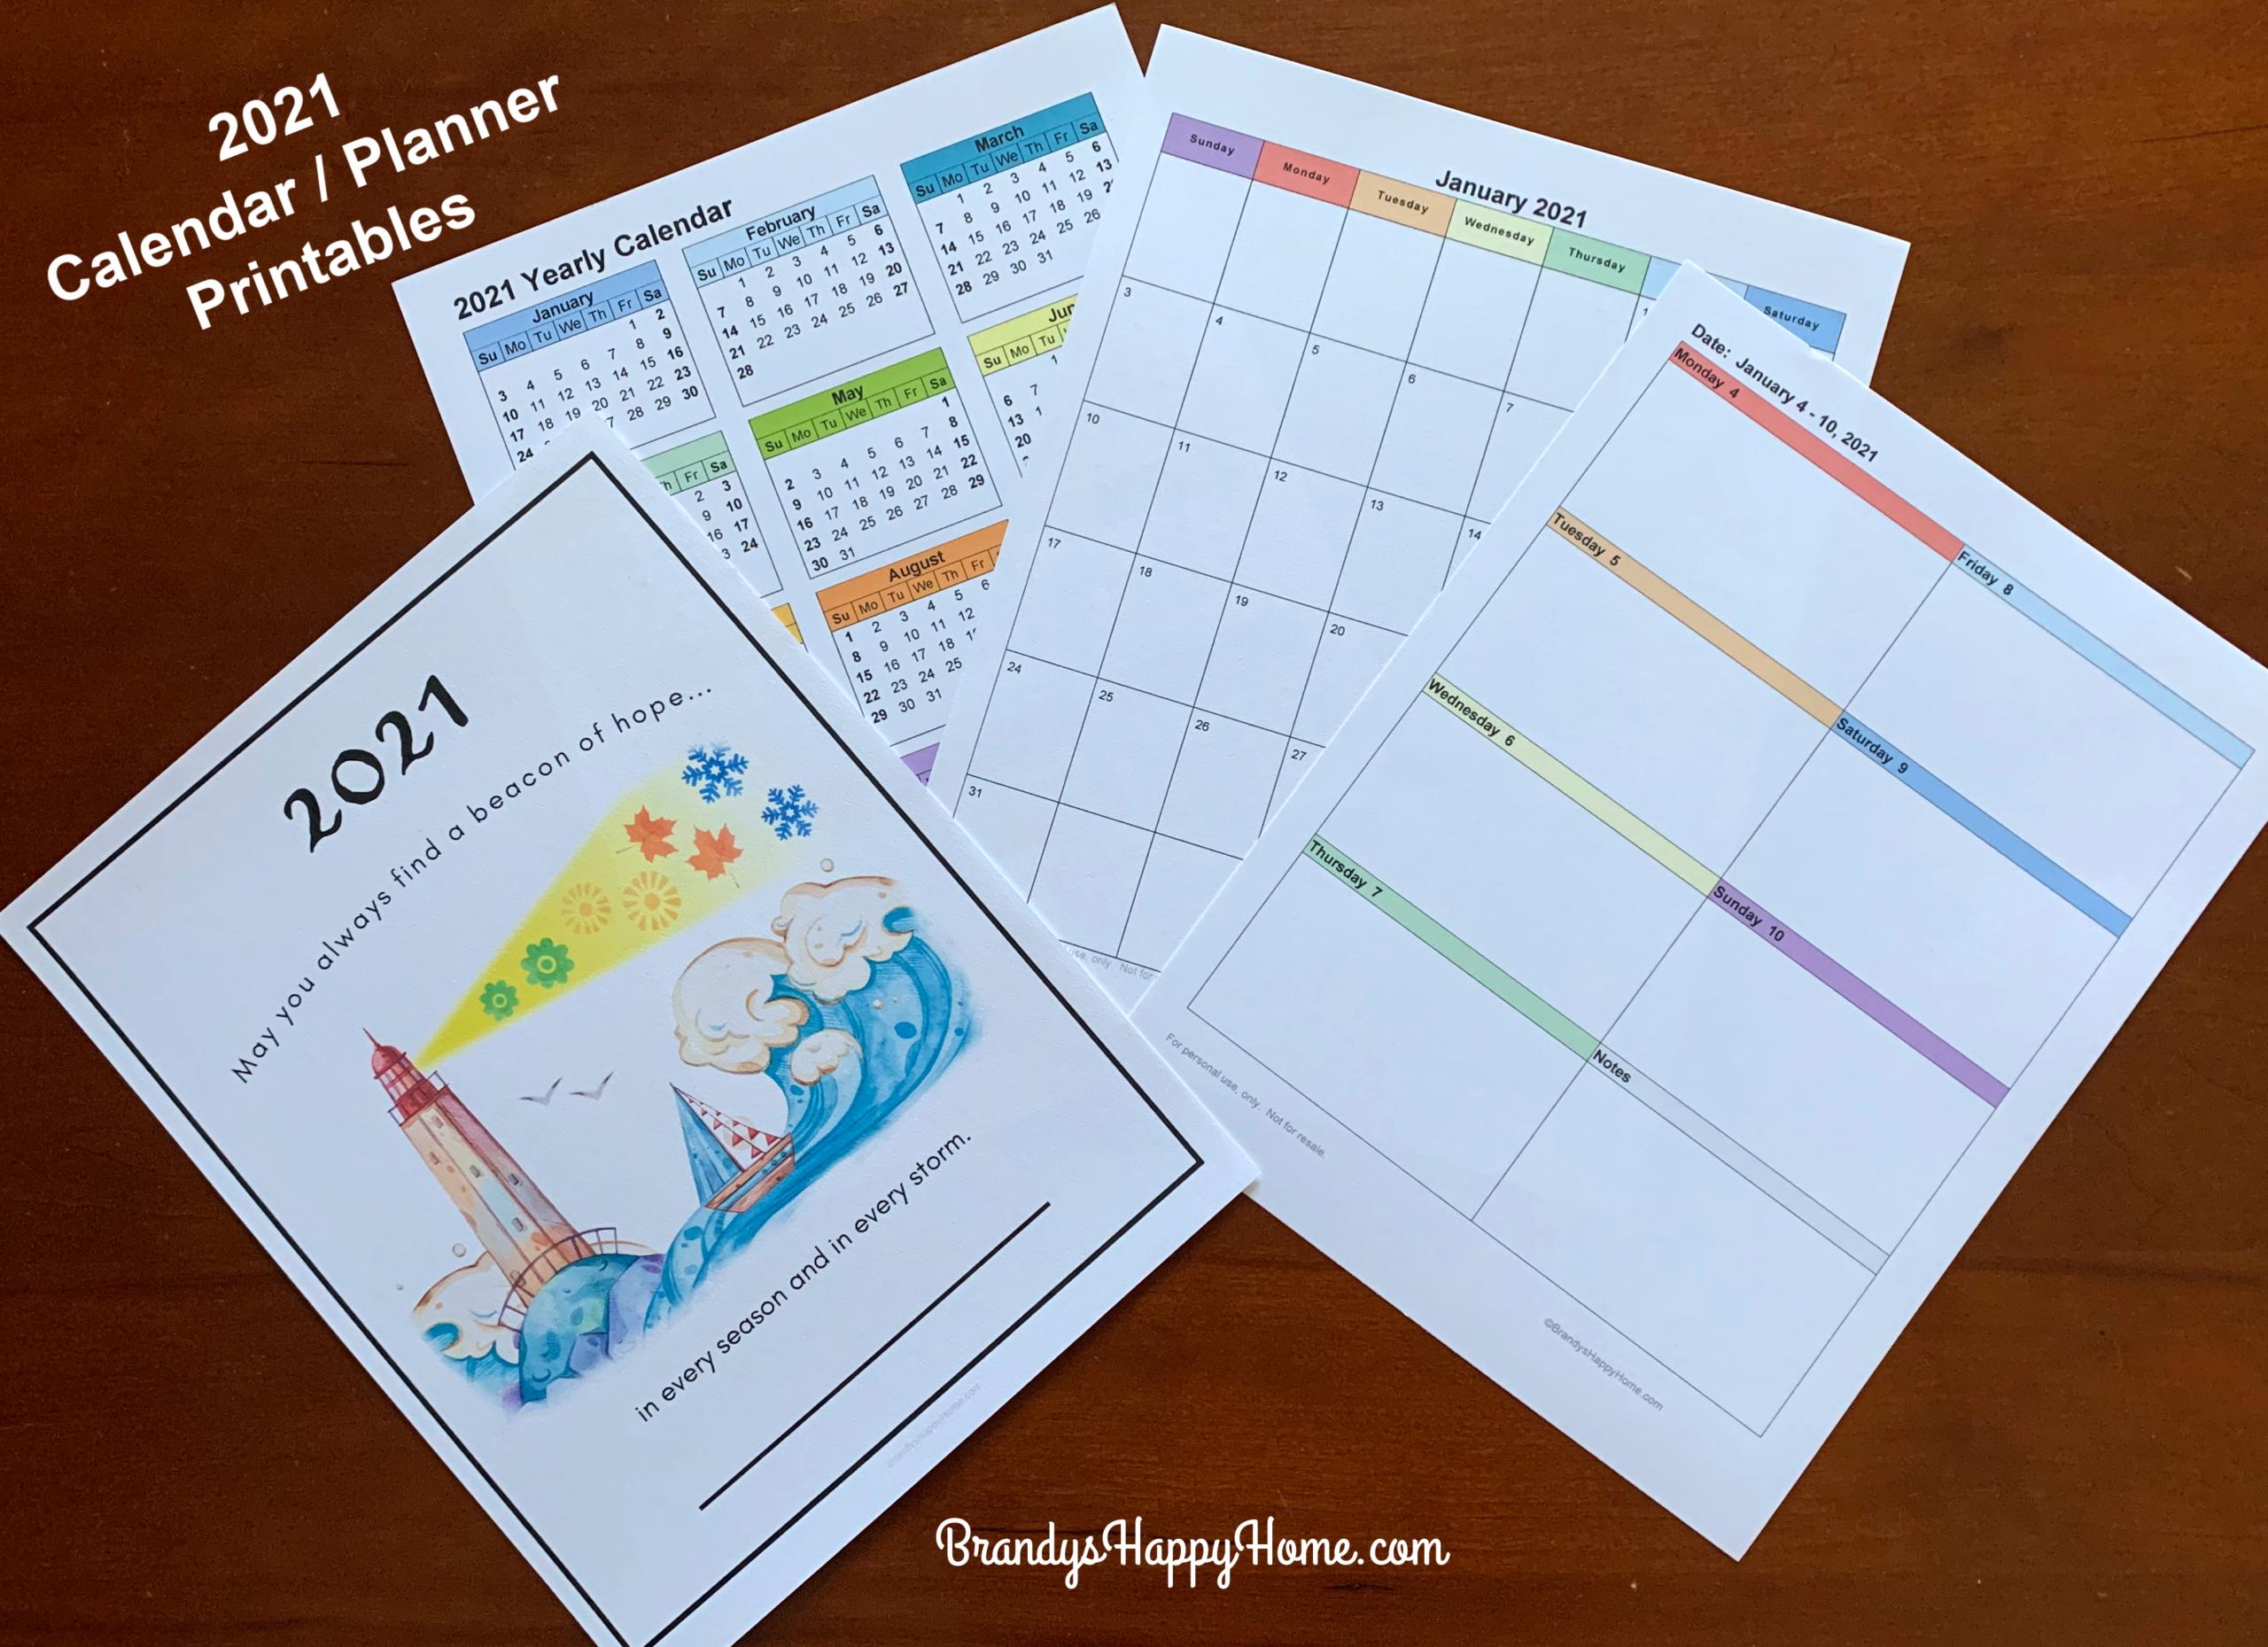 Free 2021 Calendar Planner Printables regarding 2021-2021 Two Year Planner: Calendar